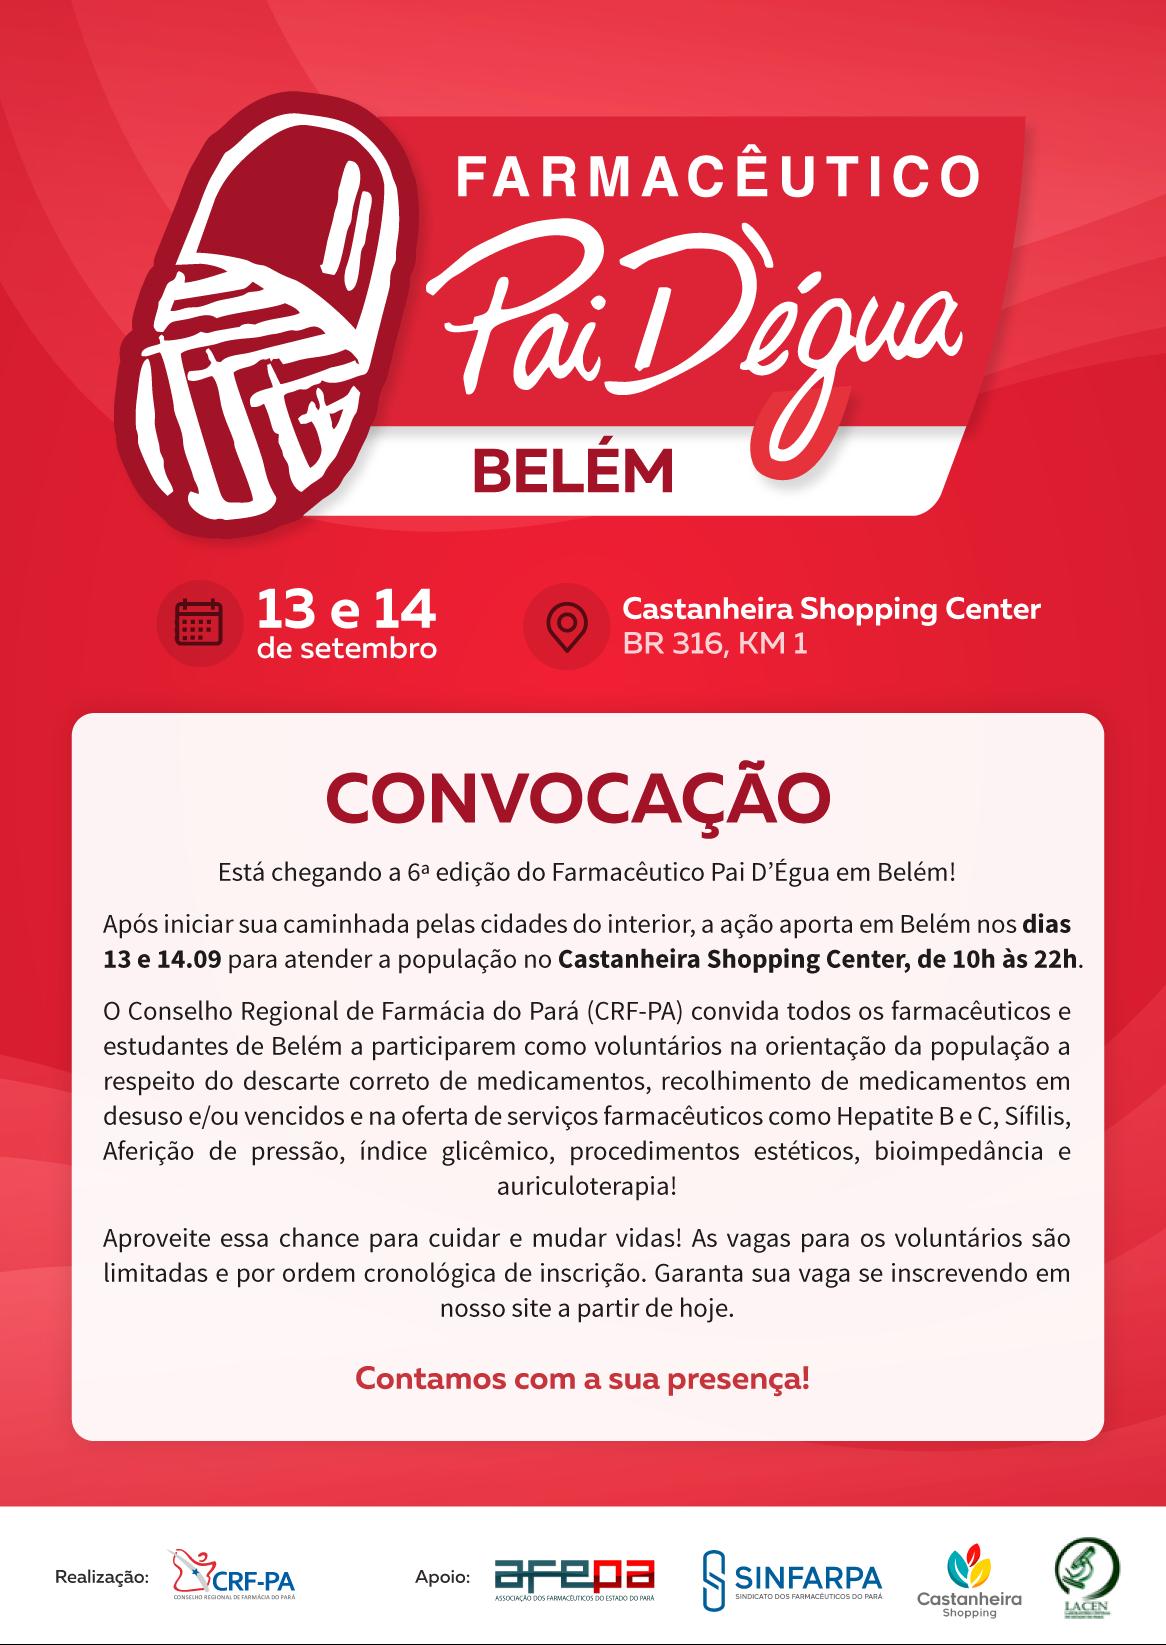 Farmacêutico Pai D'Égua em Belém